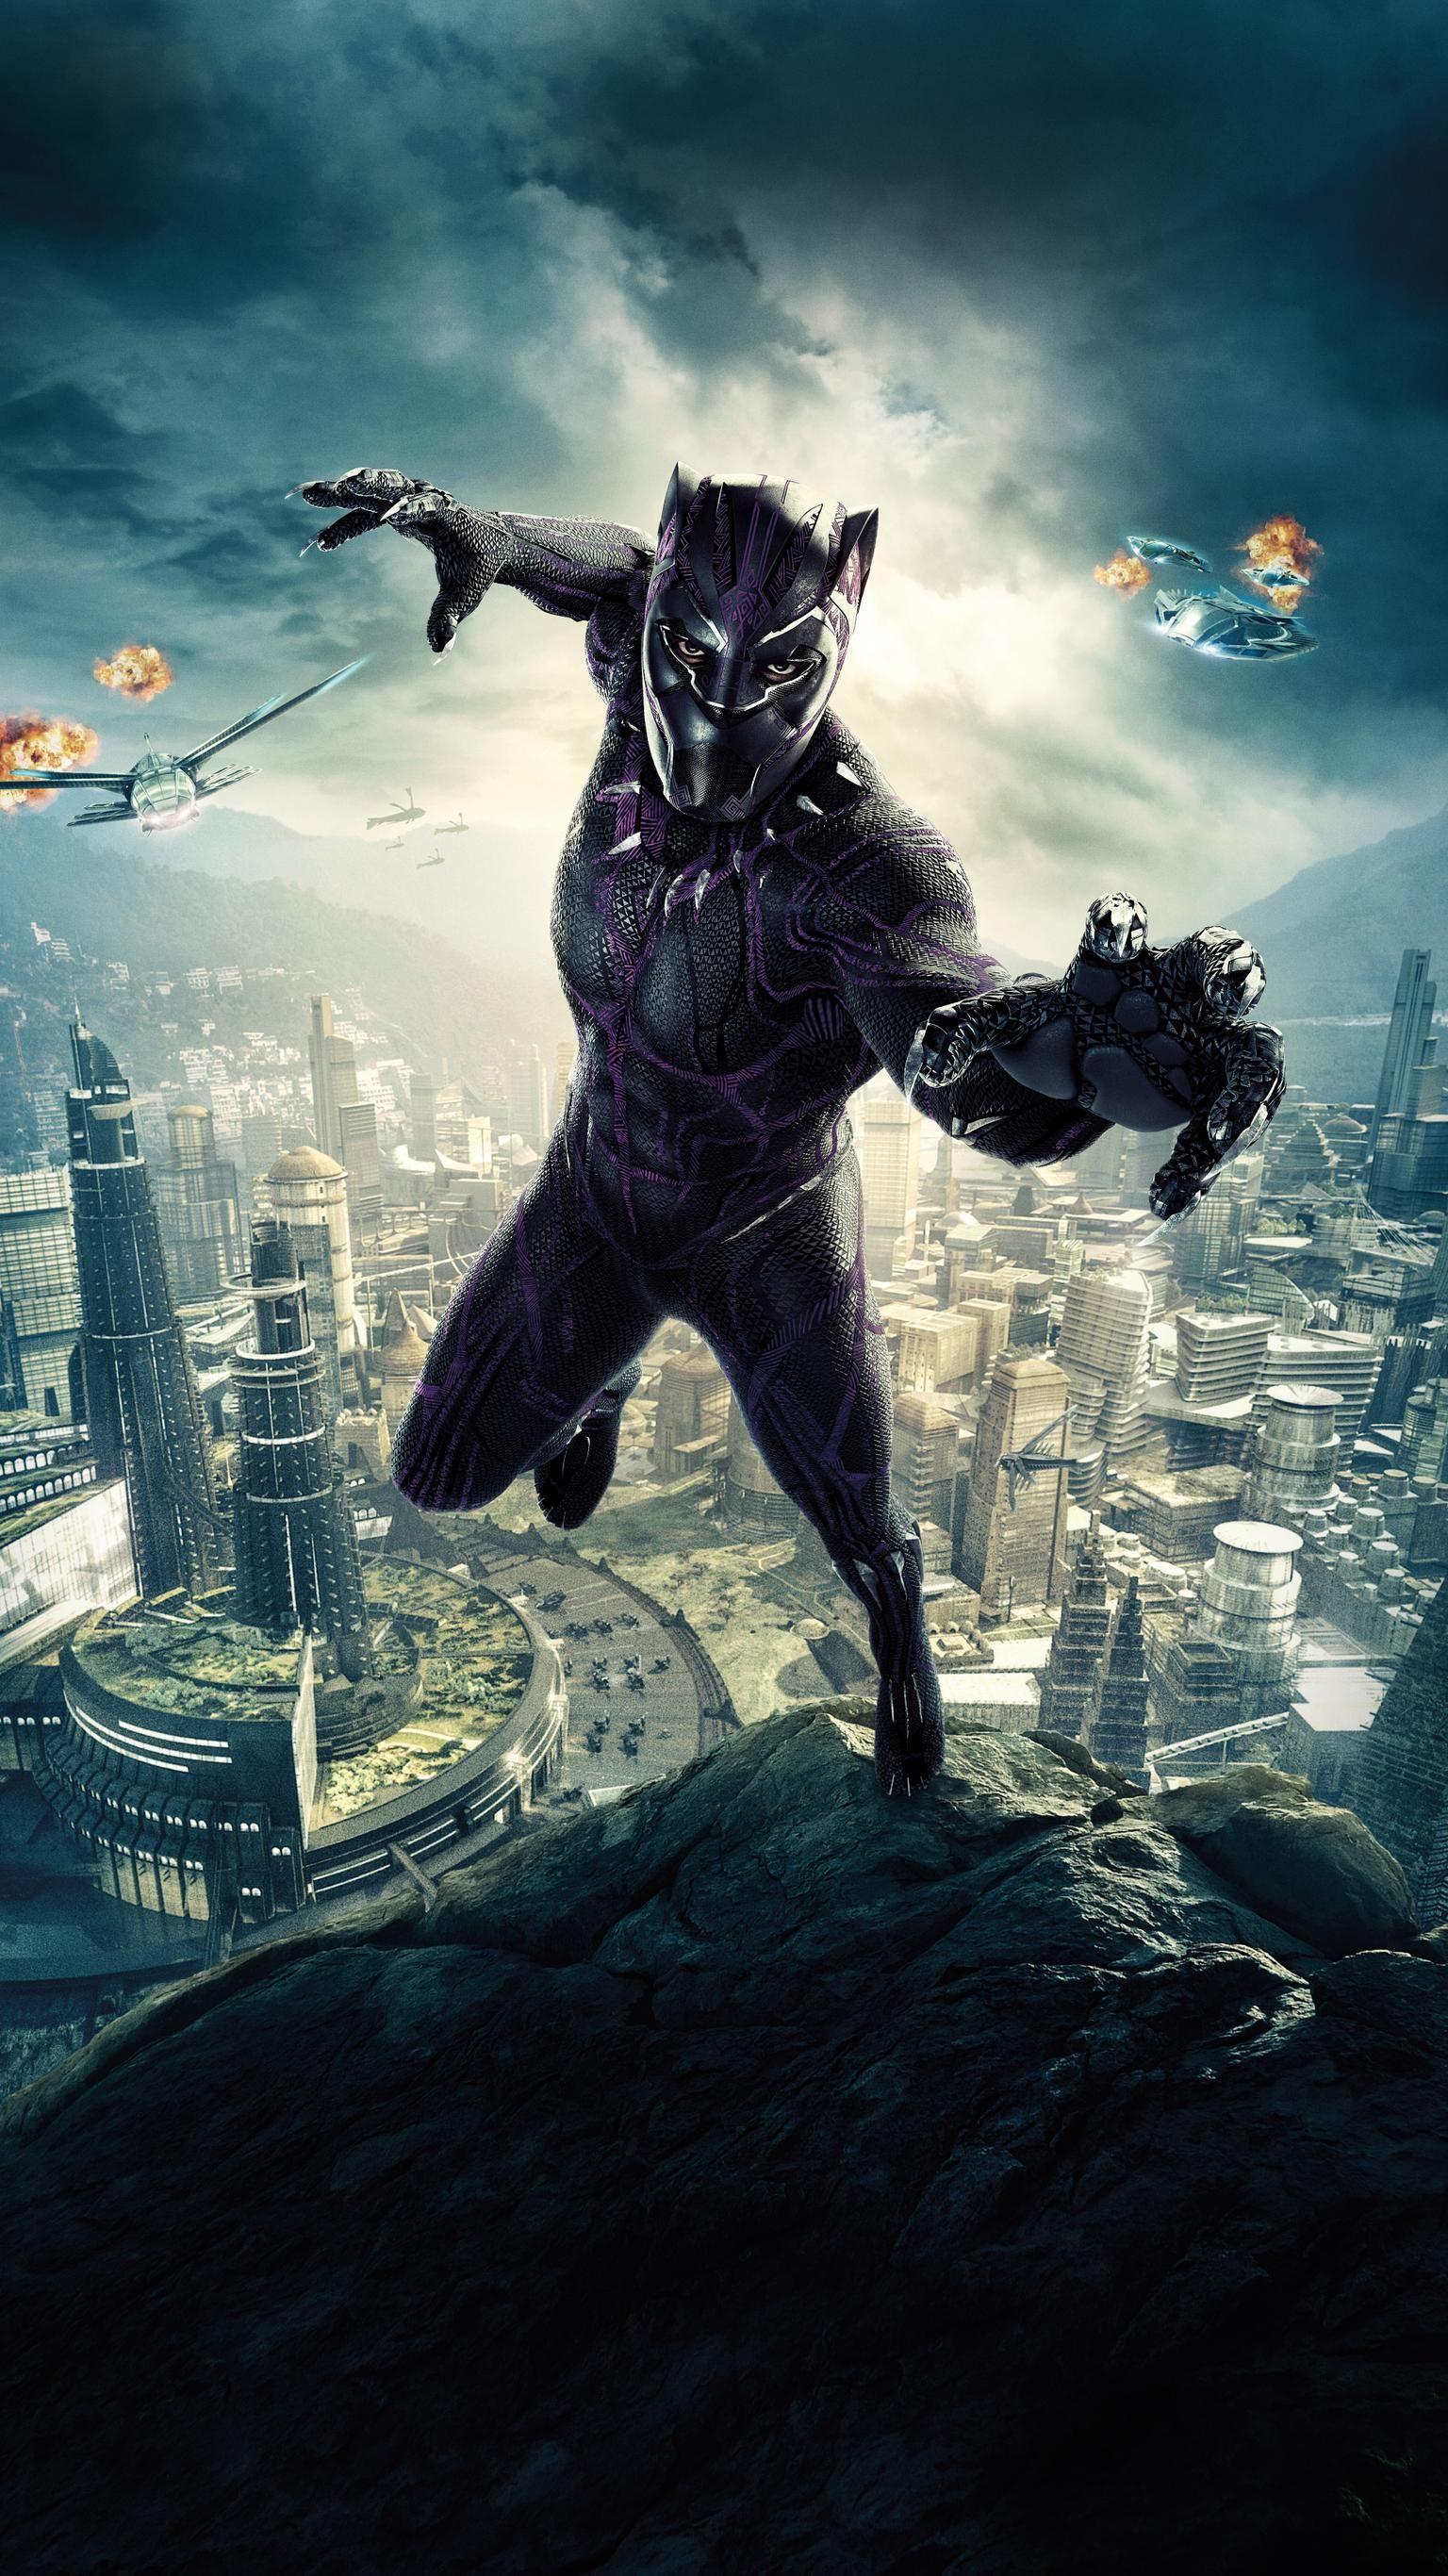 Black Panther 2018 Phone Wallpaper ブラックパンサー マーベル